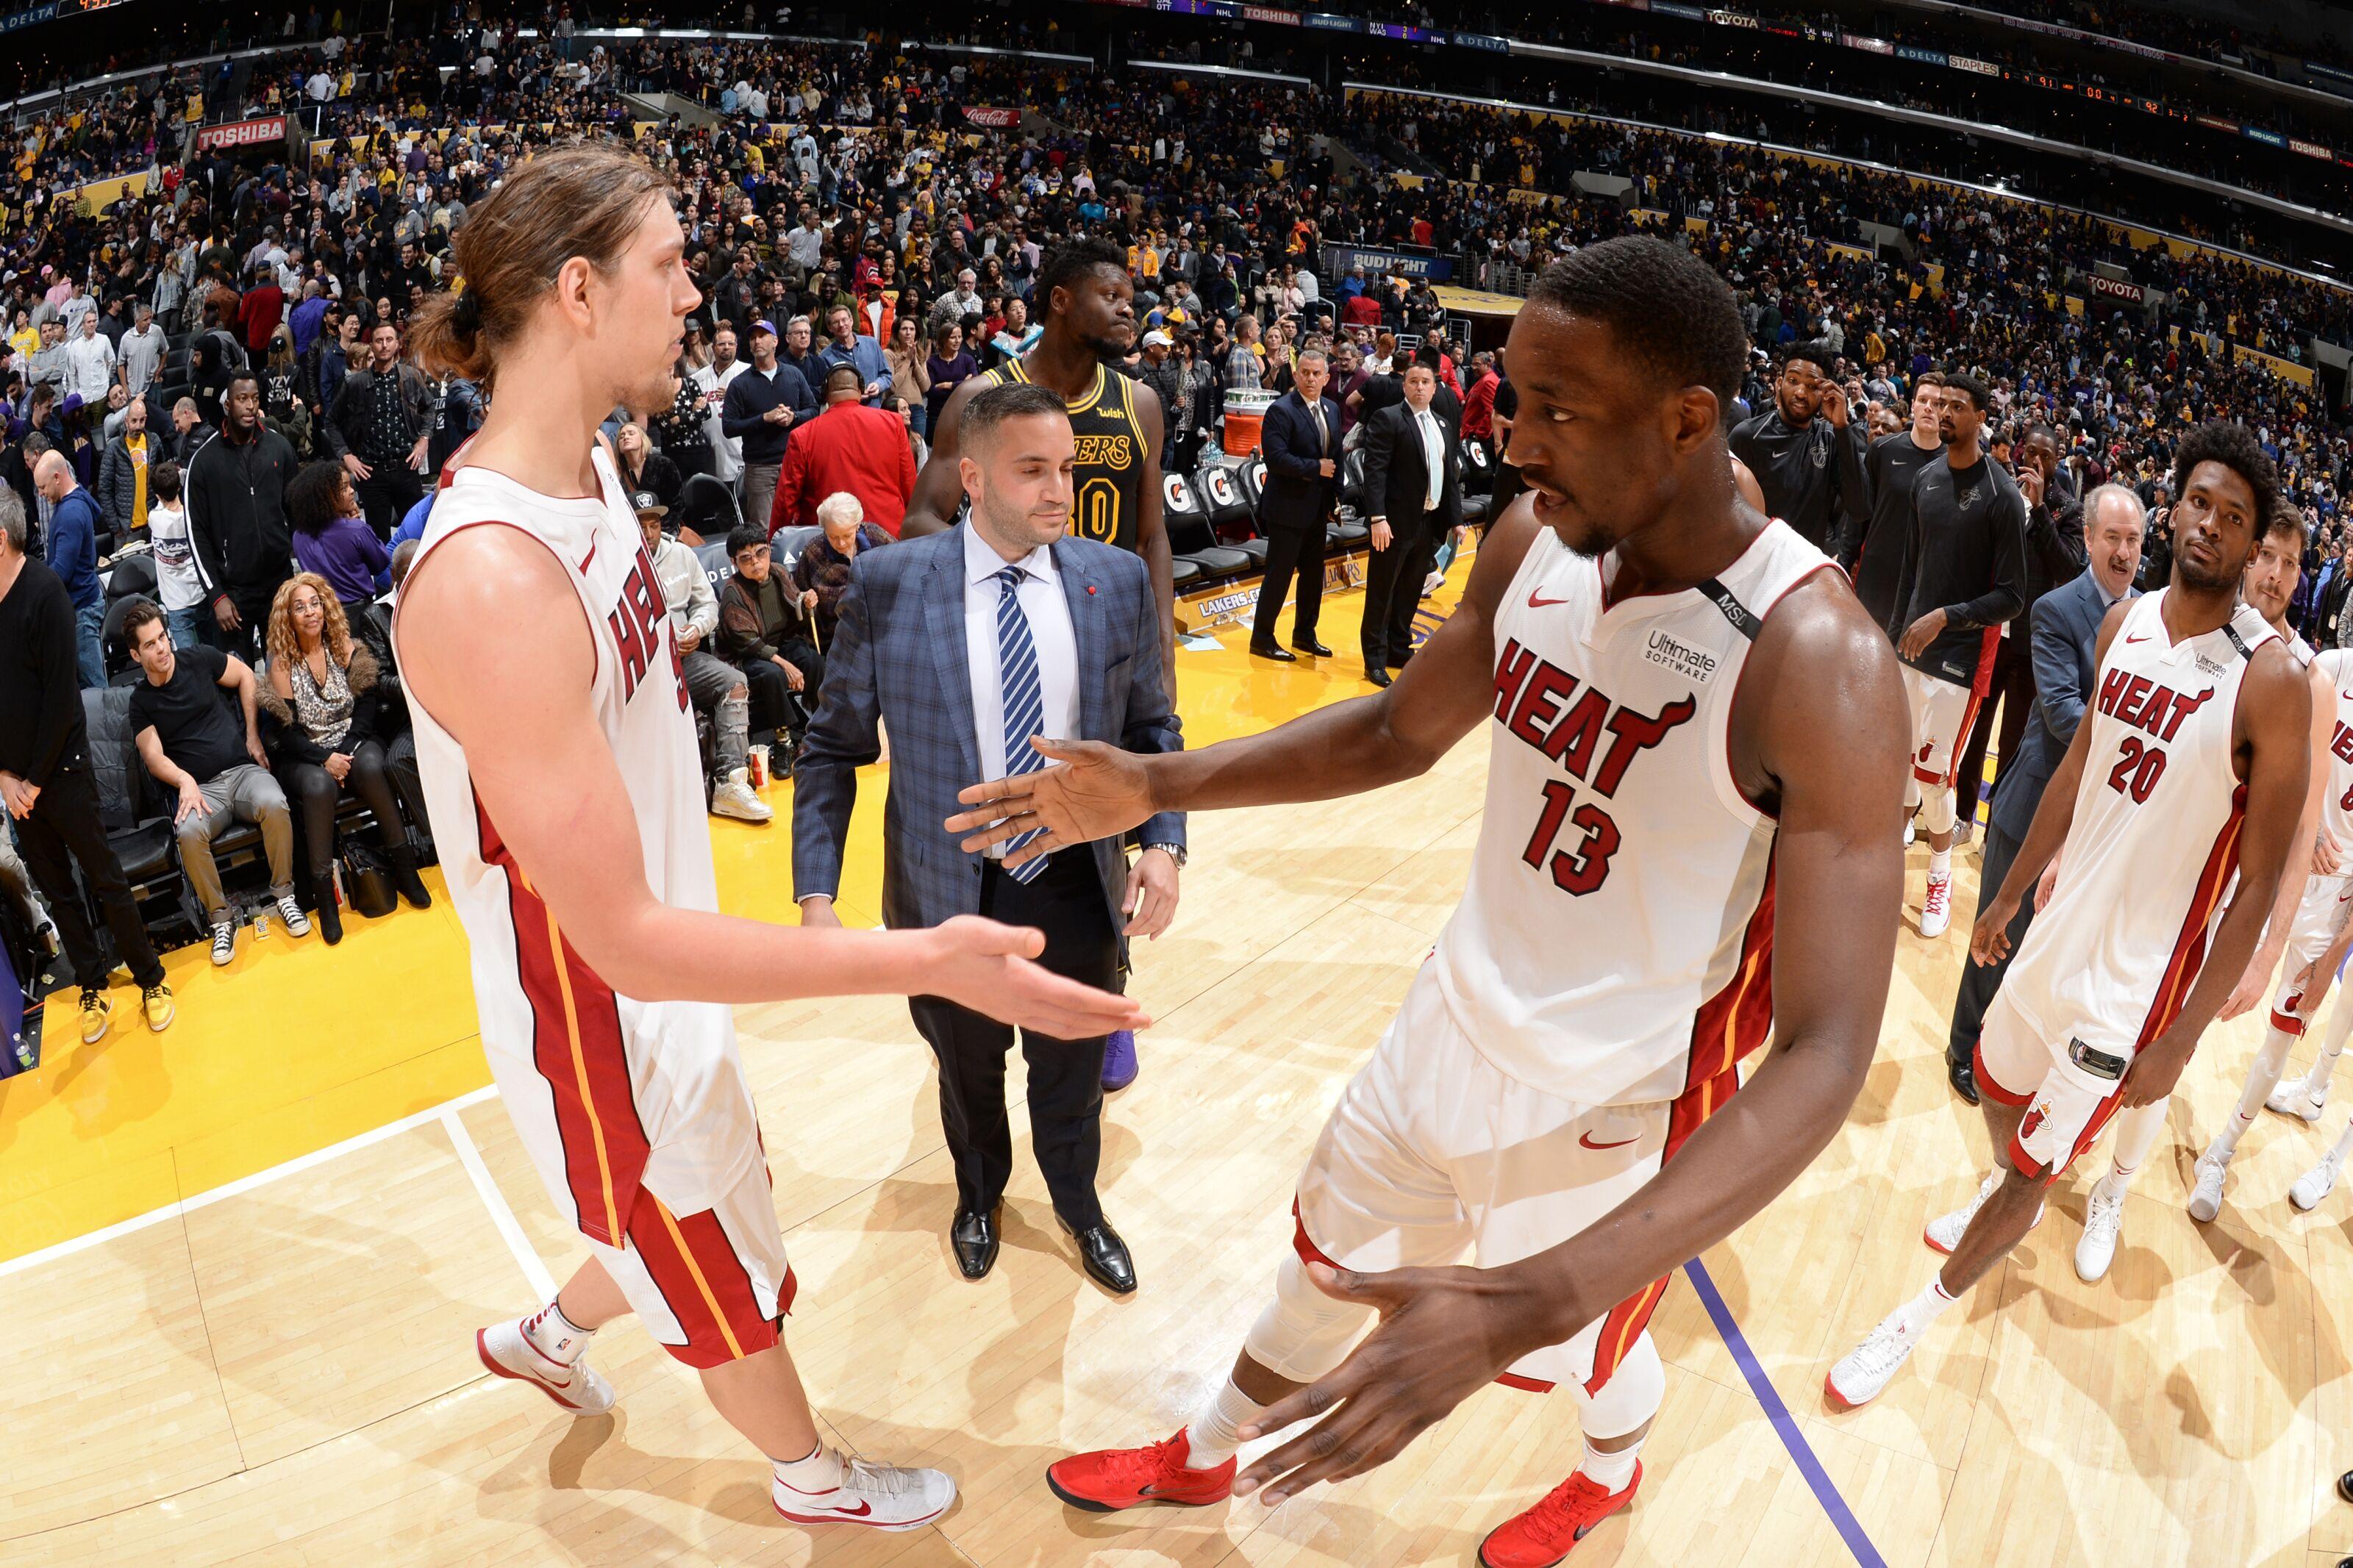 Miami Heat: The collection of big men represent peak versatility